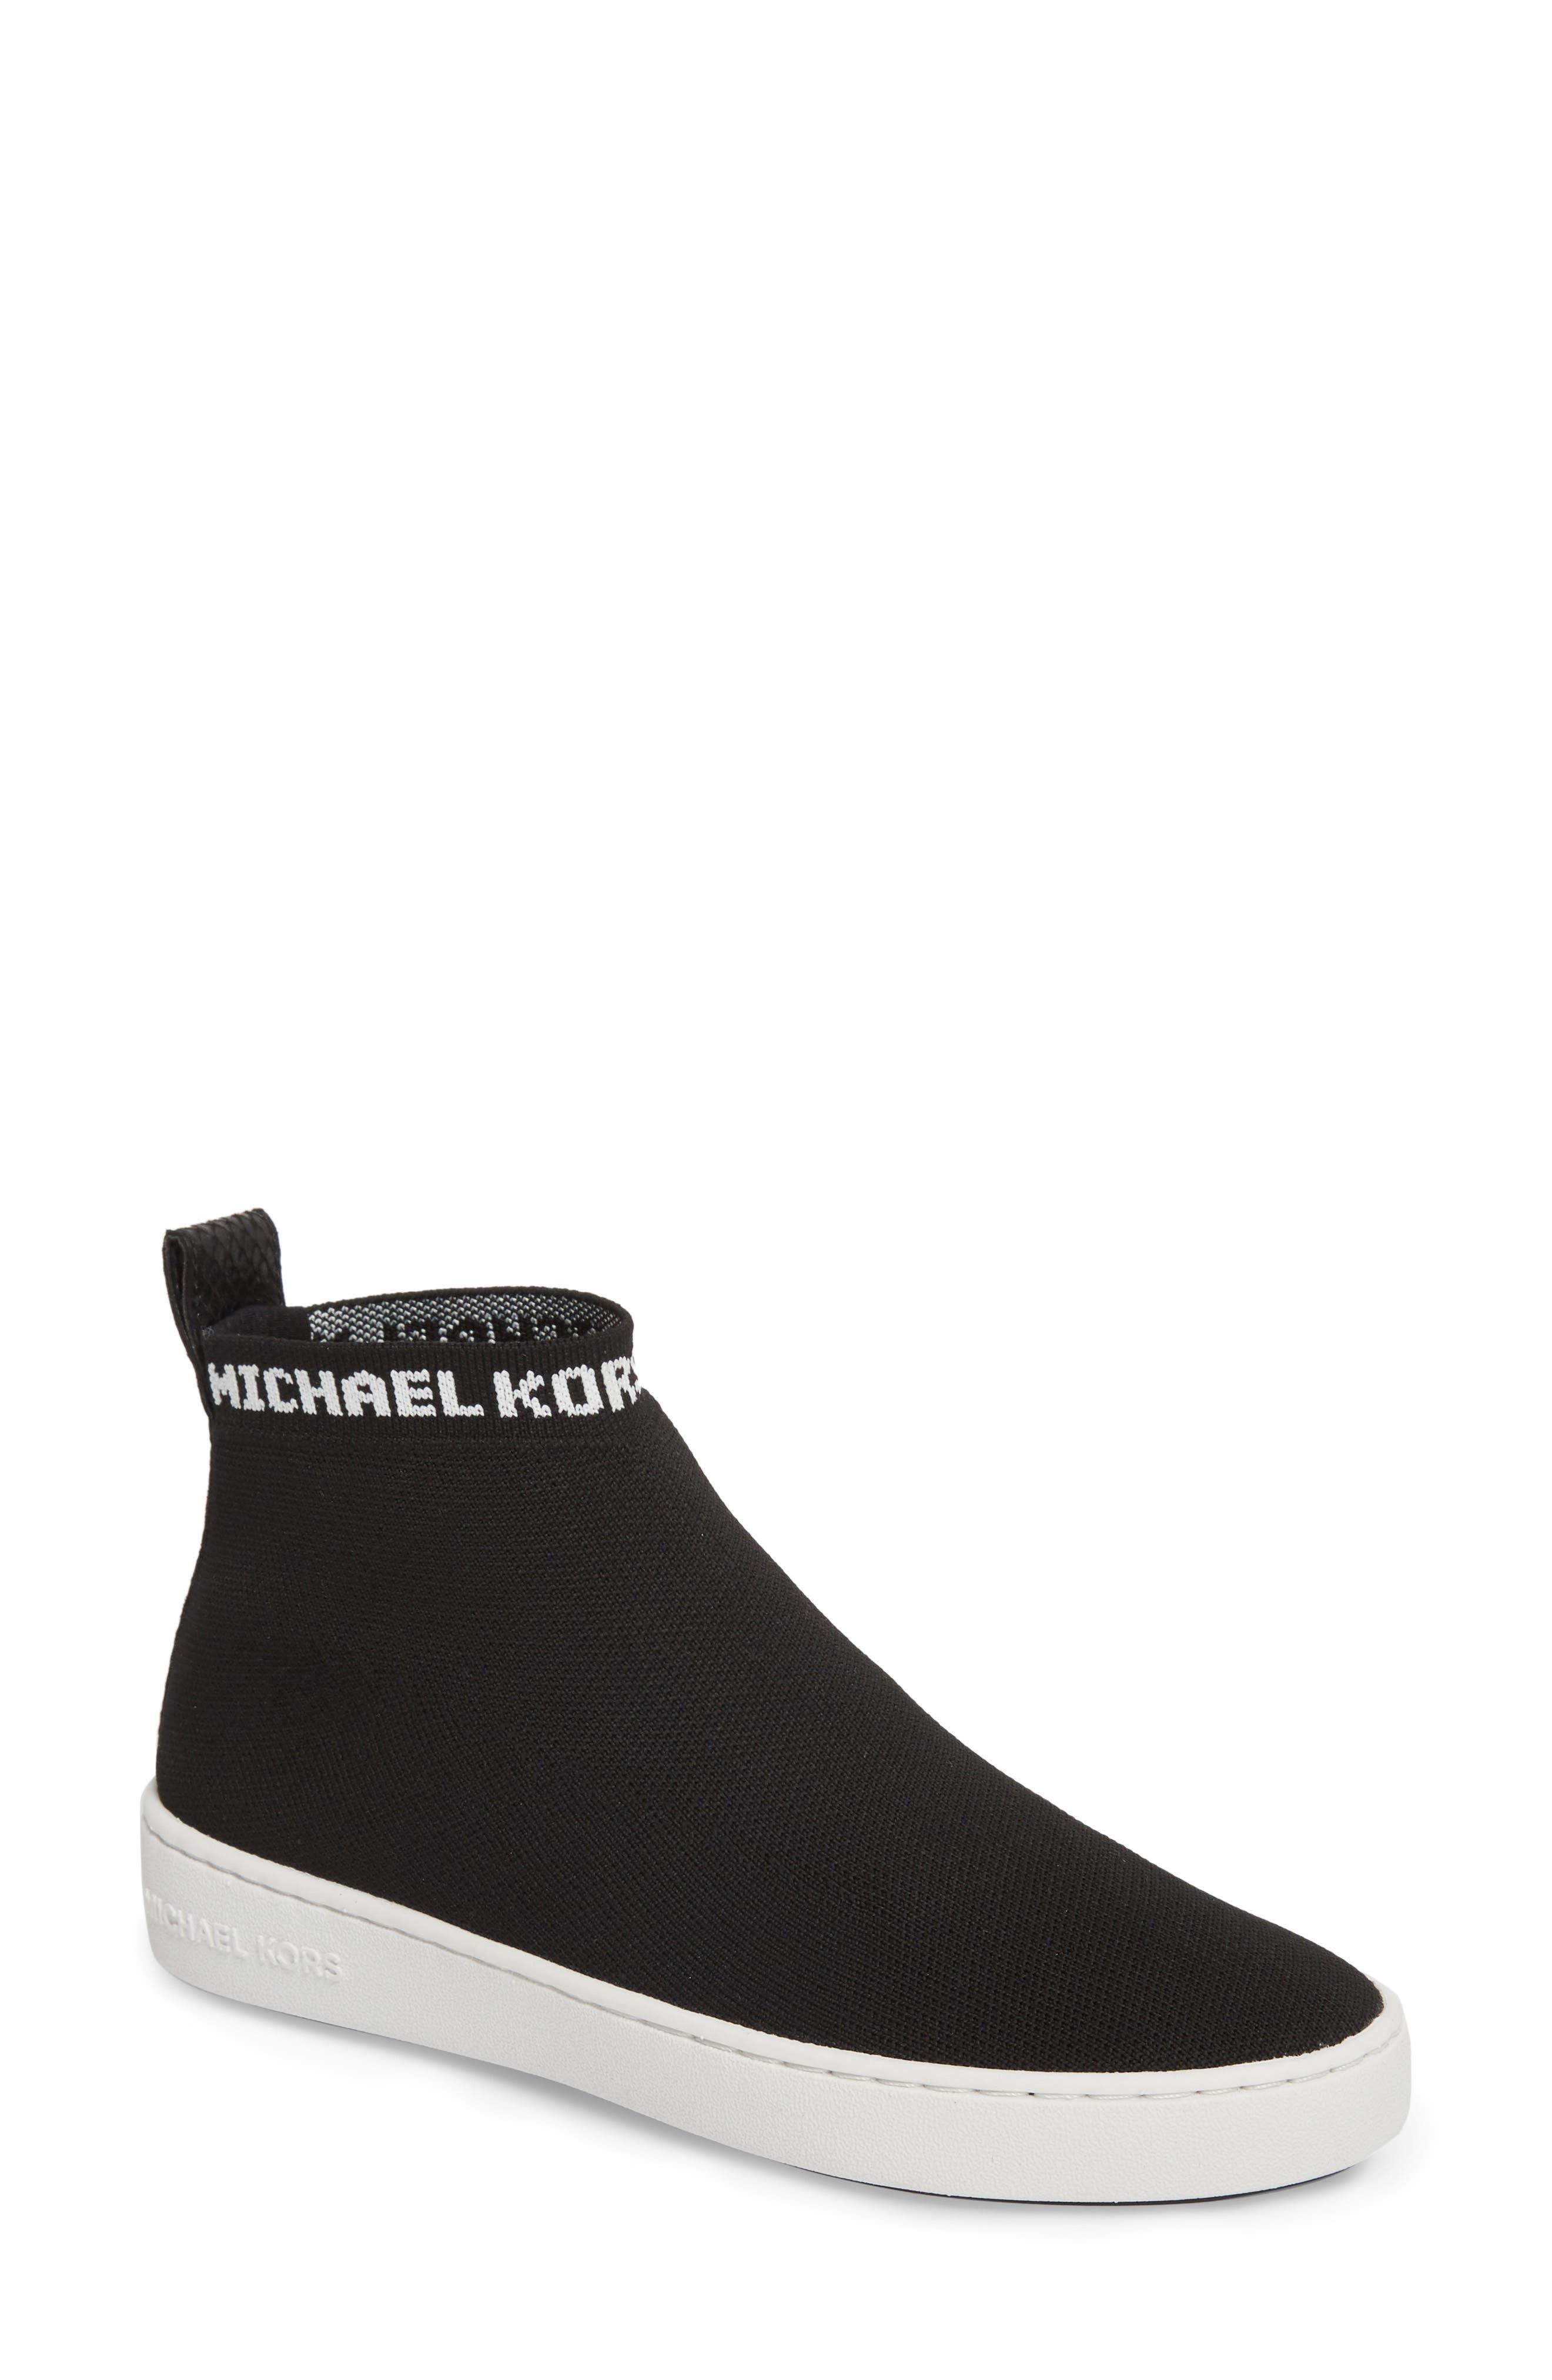 Hilda High Top Sock Sneaker,                         Main,                         color, Black Knit Fabric